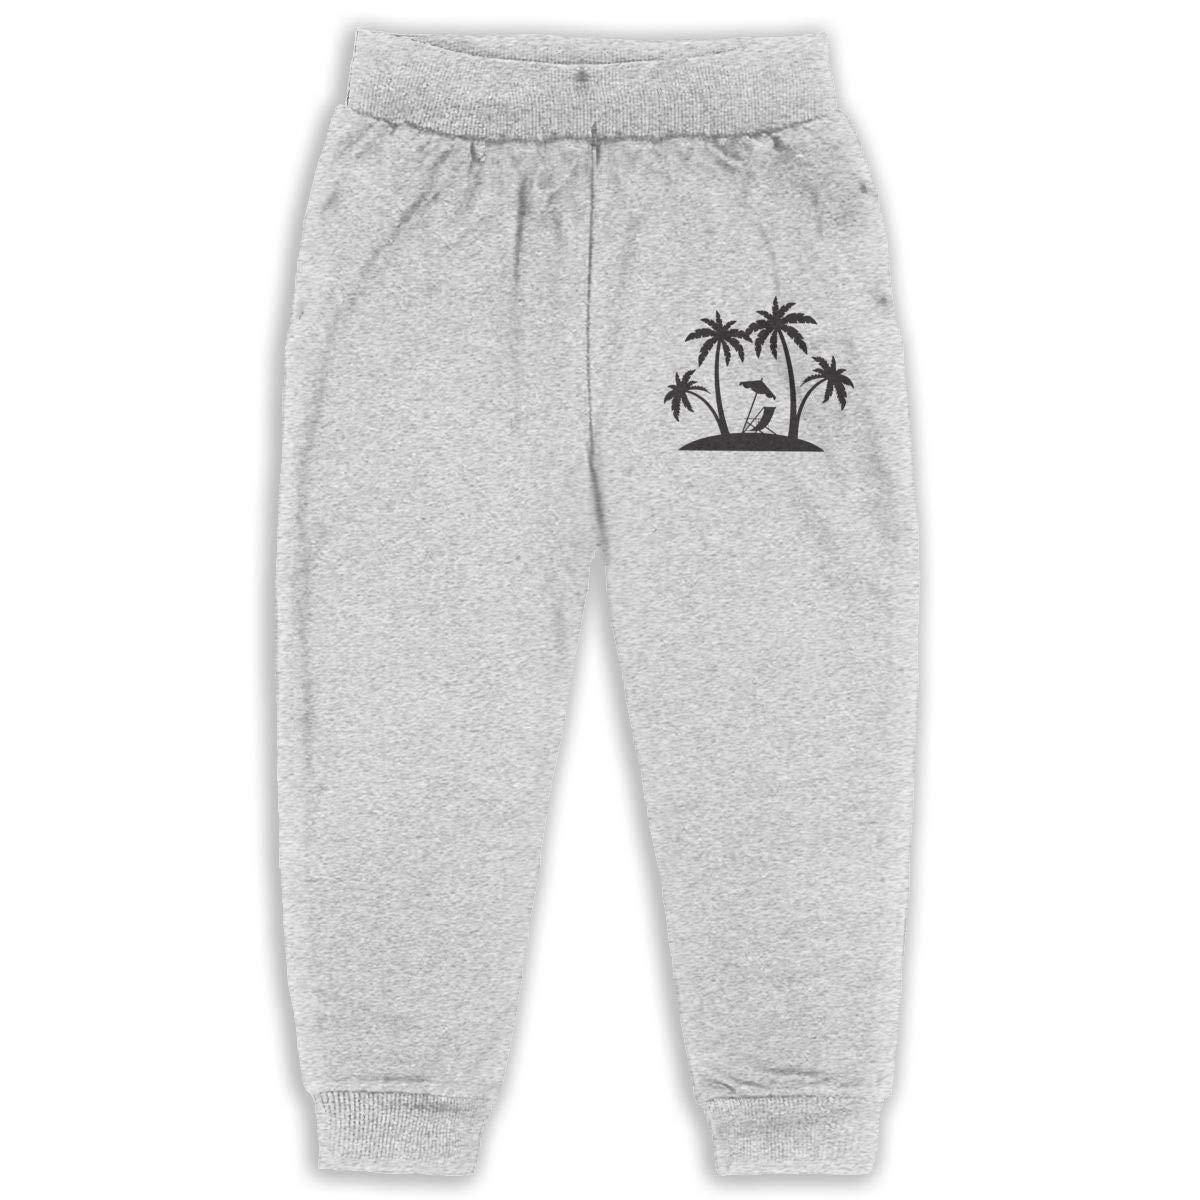 Beach Hut Art Silhouette Children Cartoon Cotton Sweatpants Sport Jogger Elastic Pants